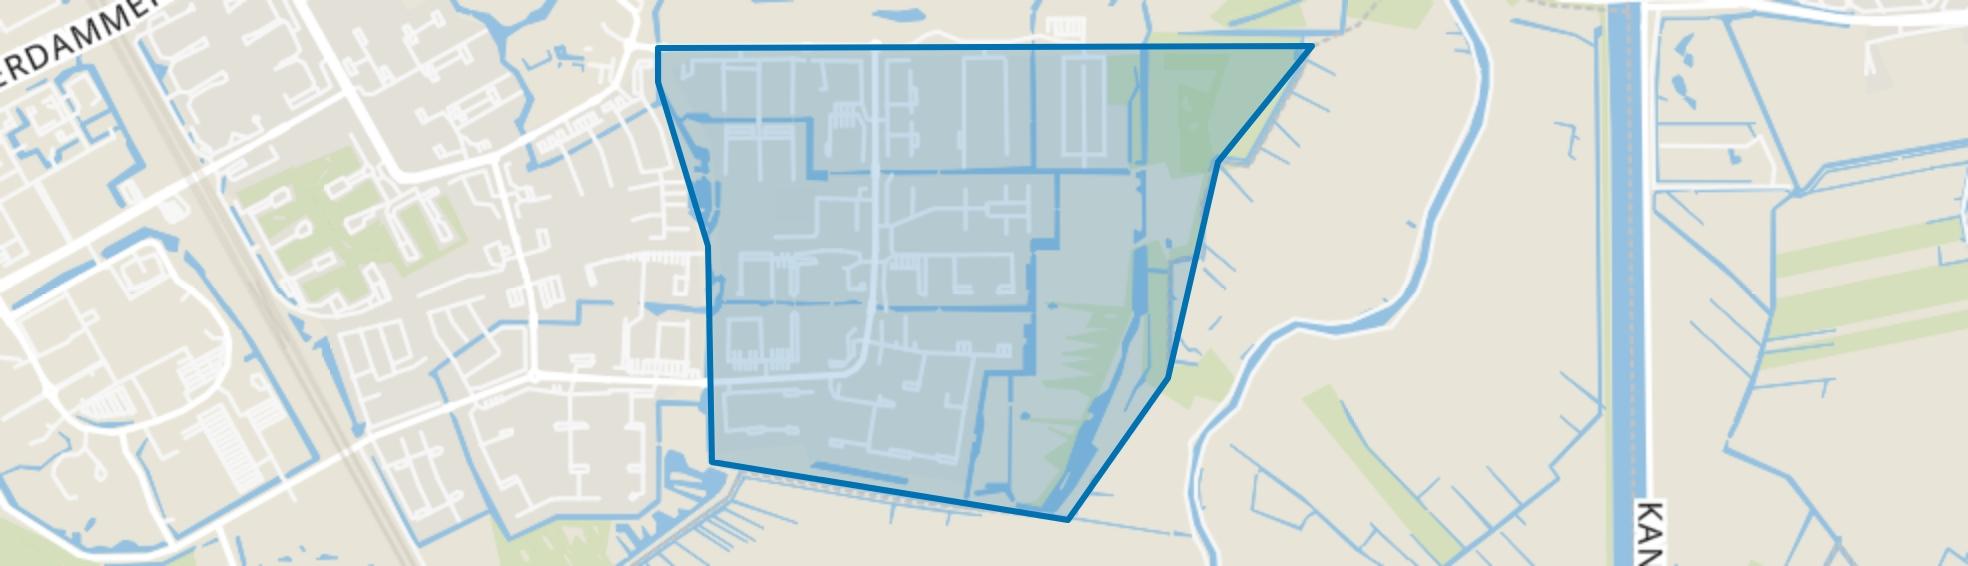 Gein, Amsterdam map